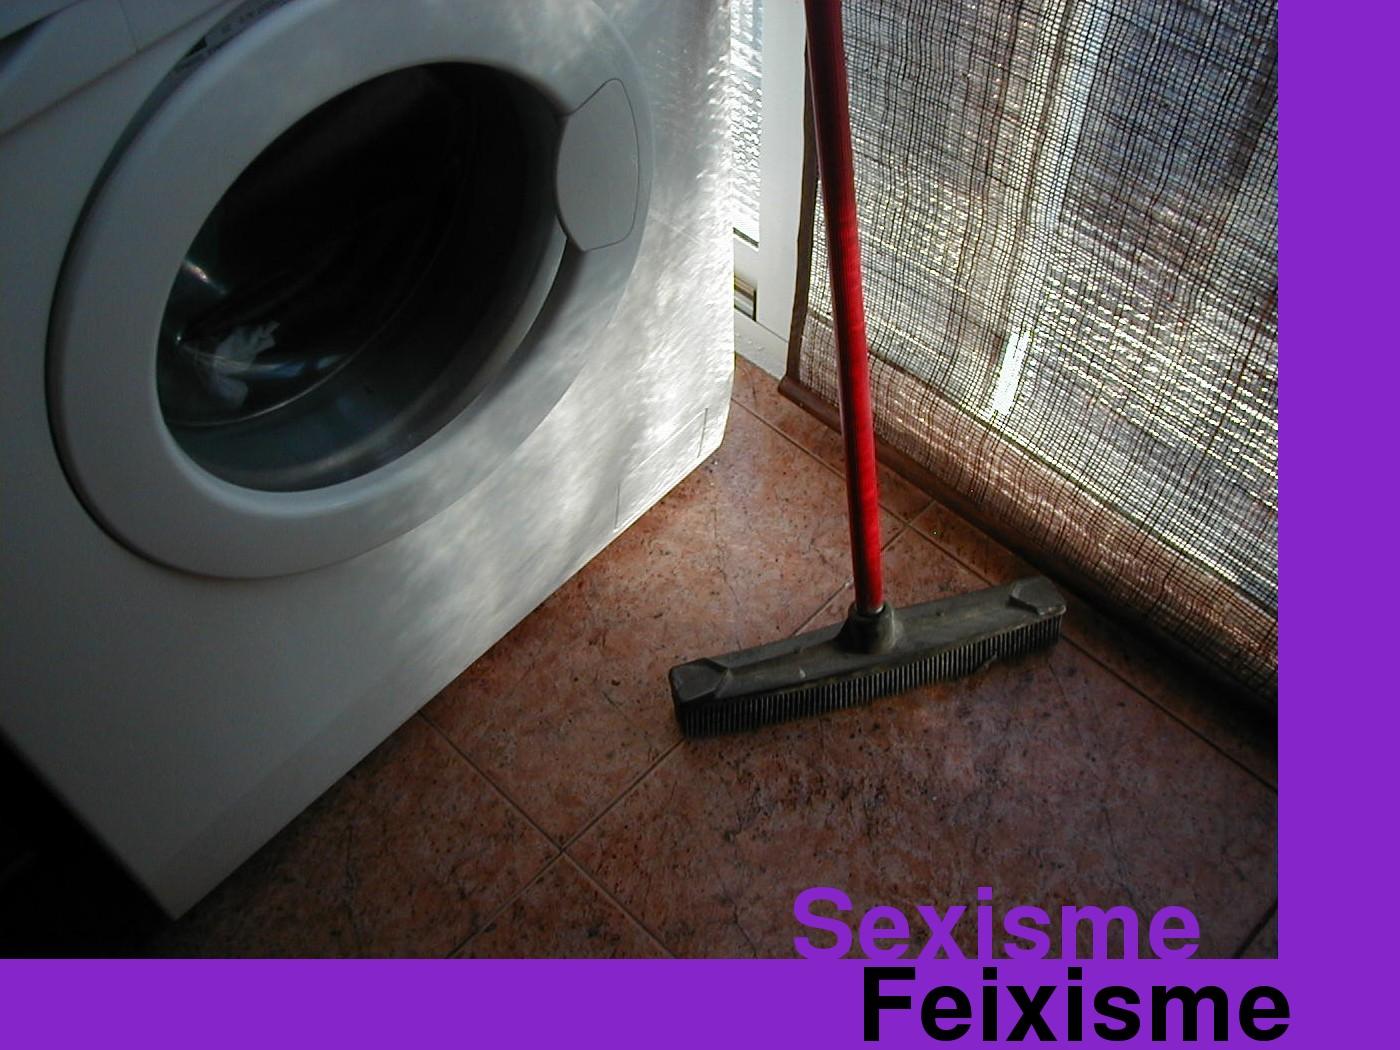 sexisme_fascisme_1.jpg